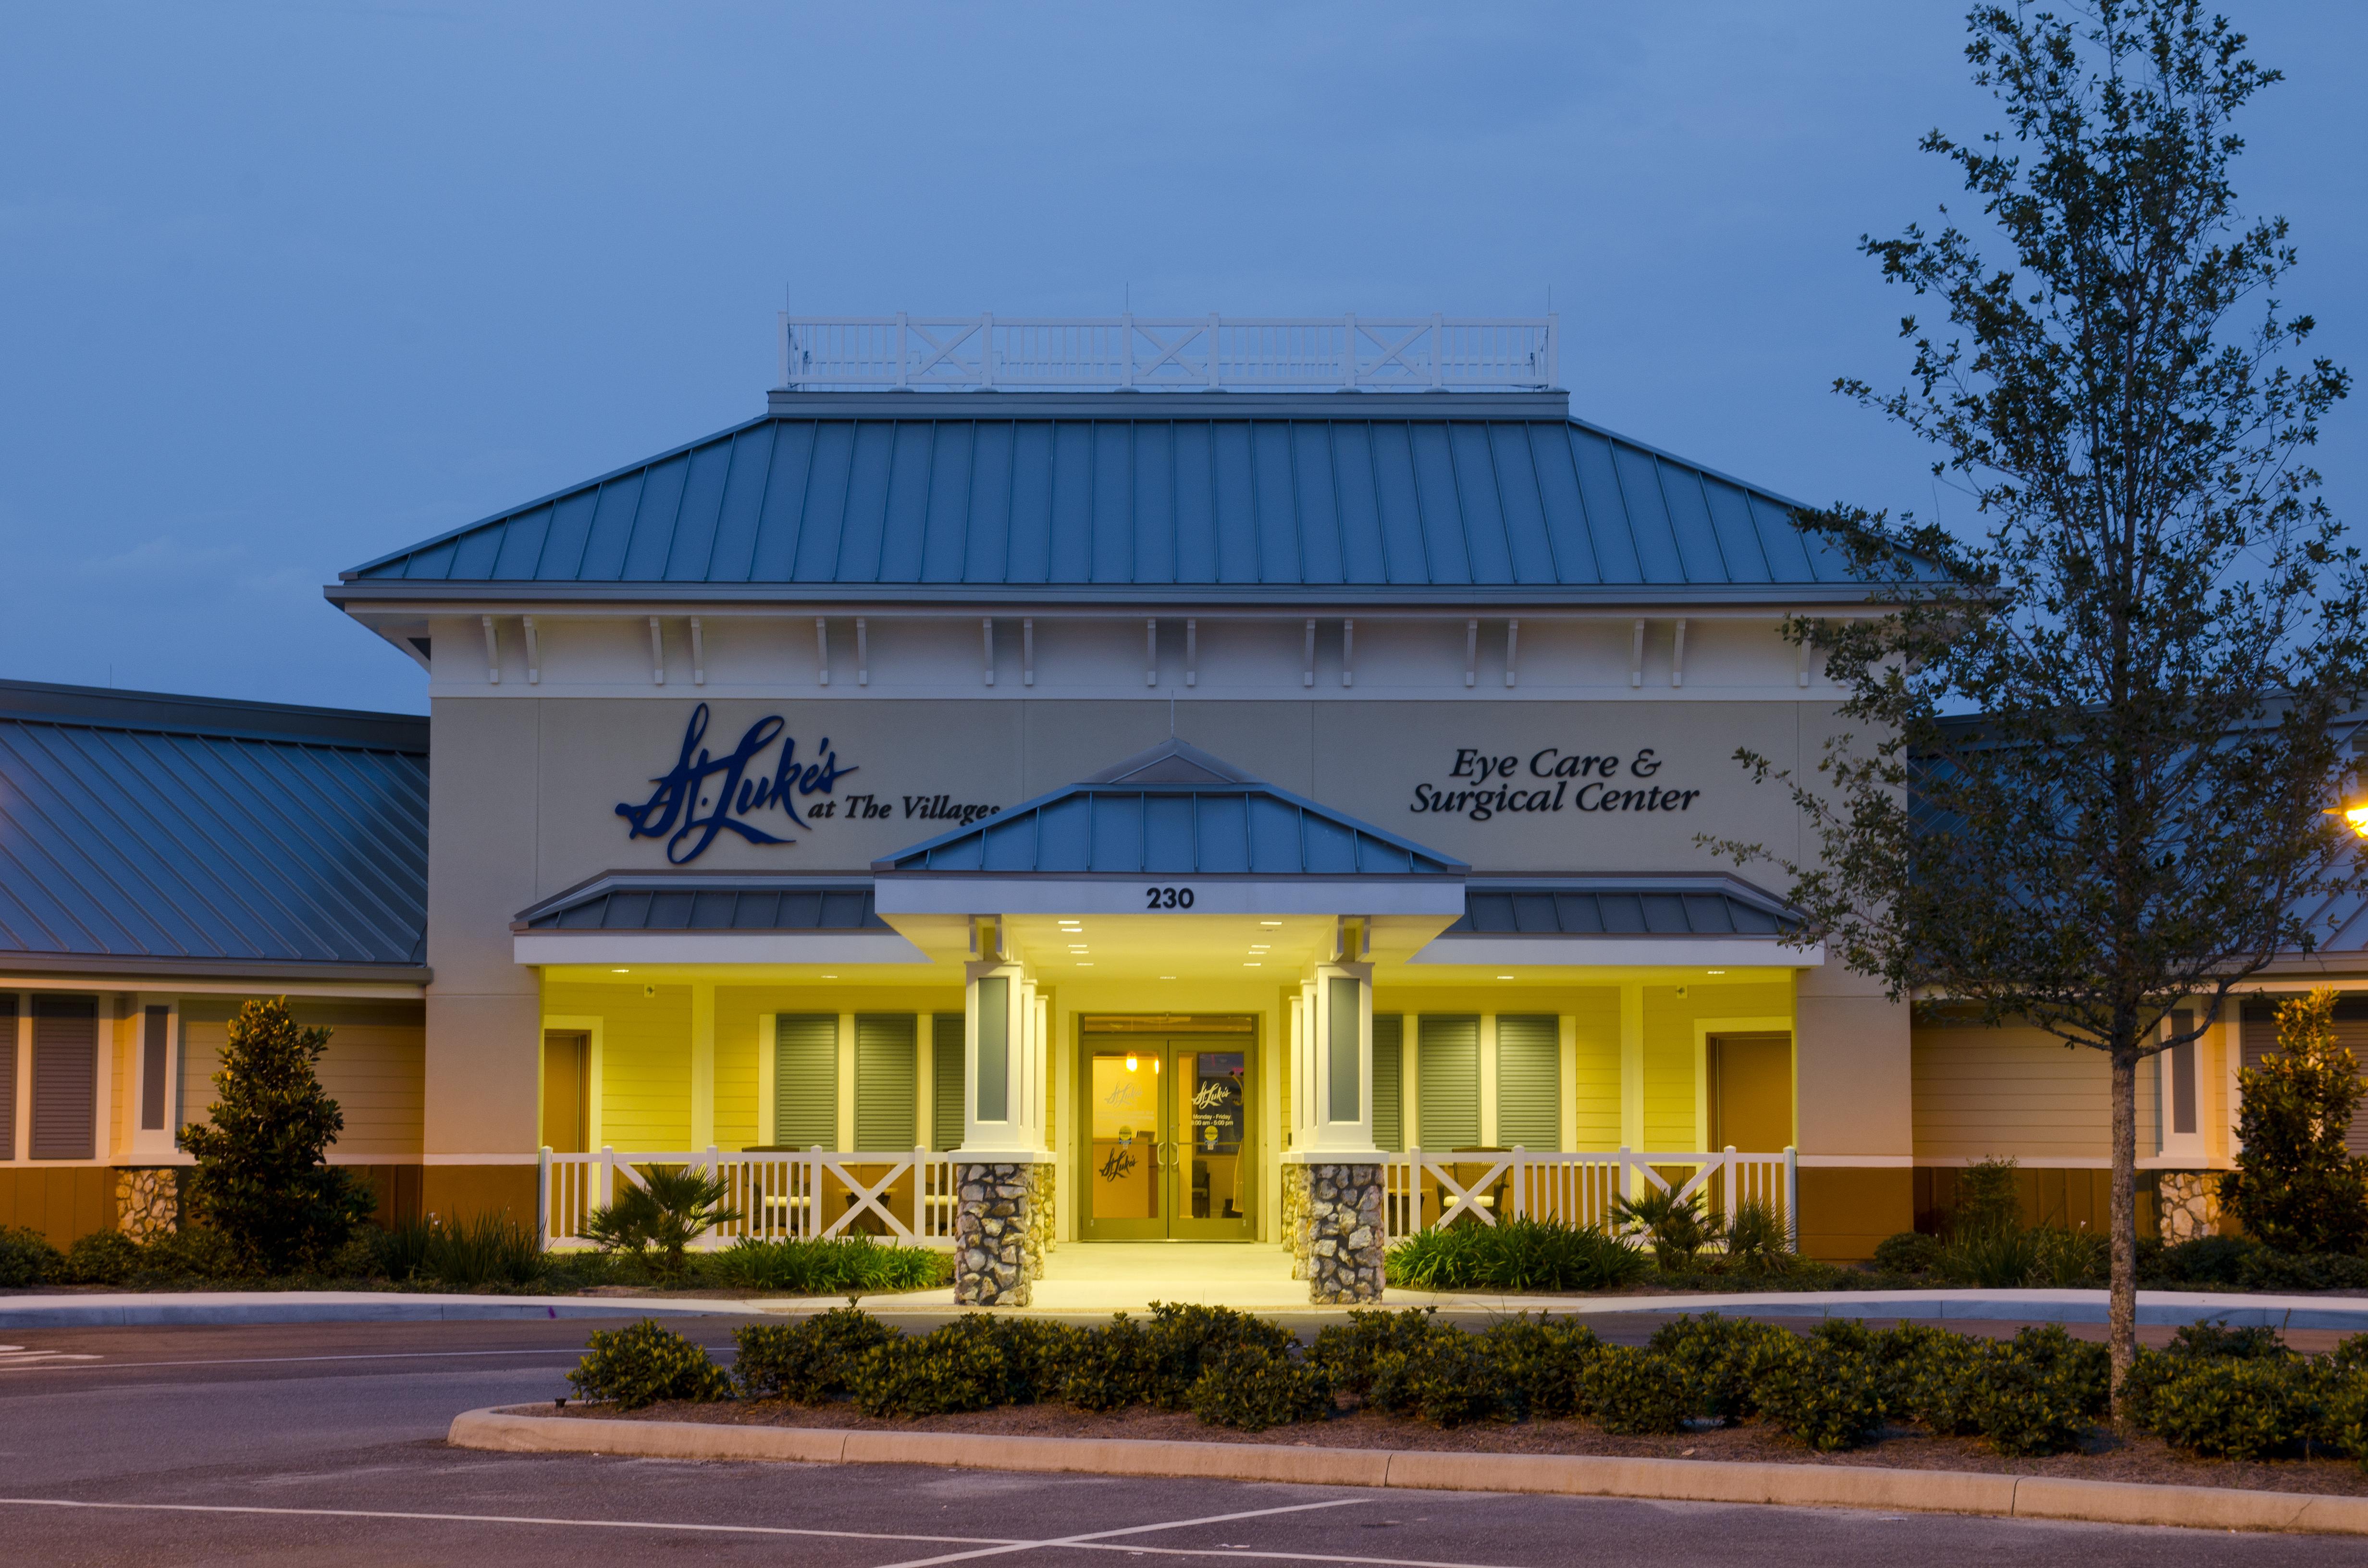 St. Luke's Eye Surgery Center